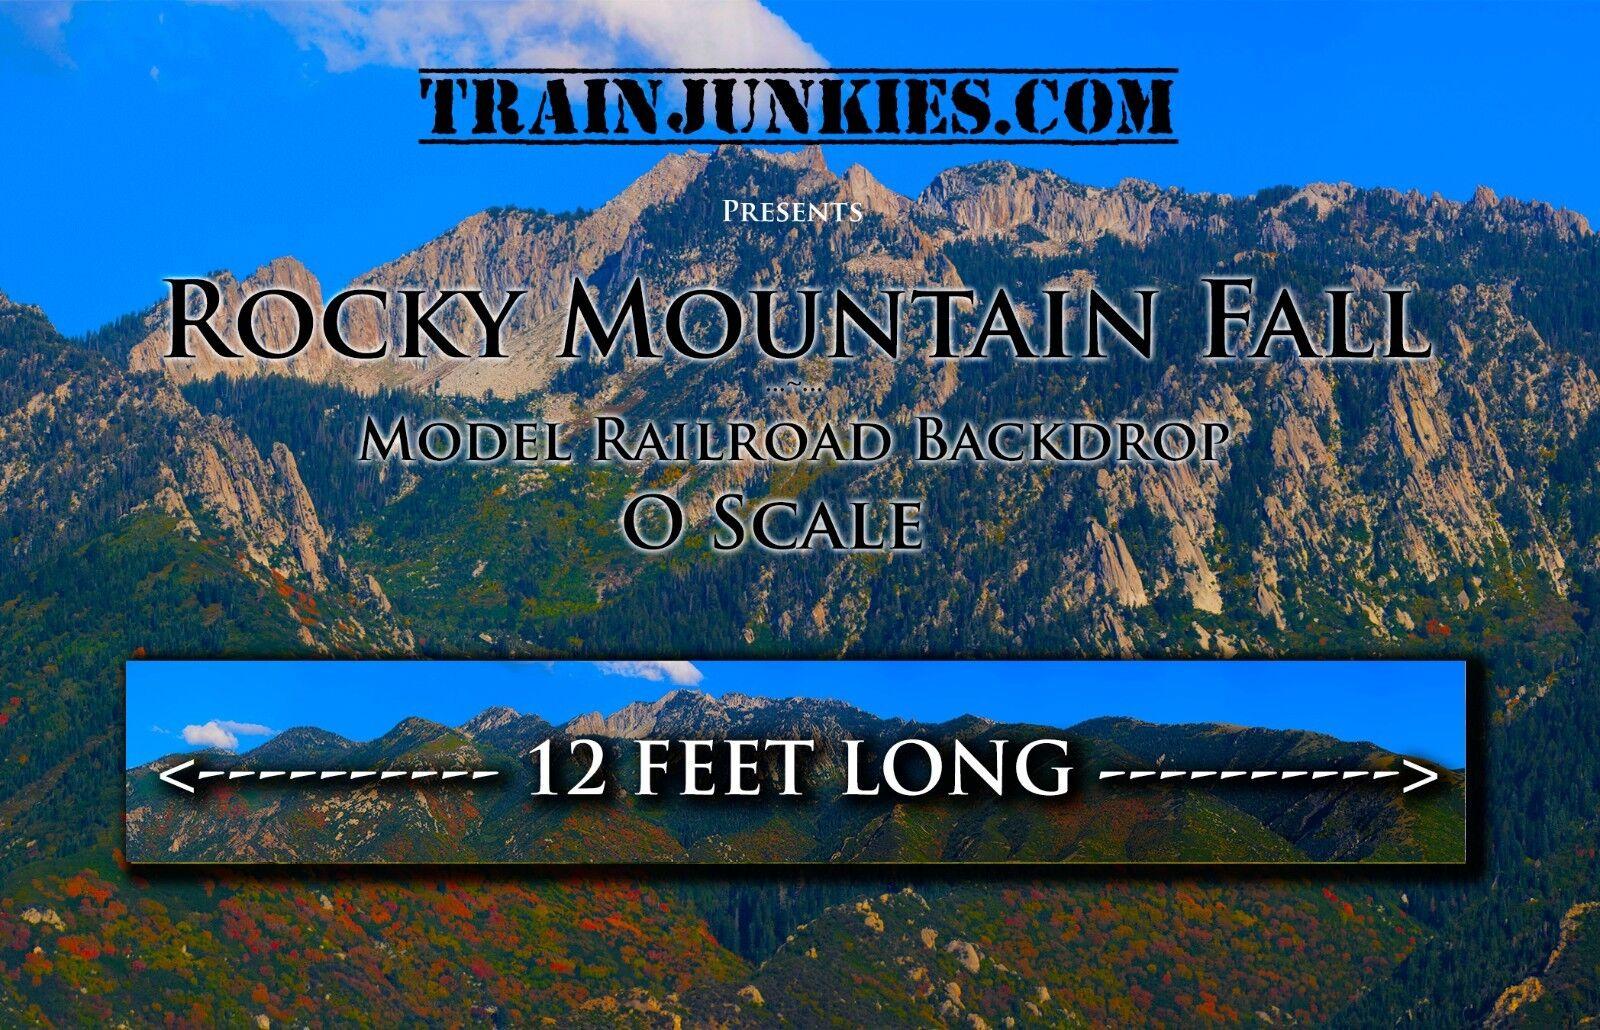 TrainJunkies O Scale Rocky Mountain Ftutti modellolo Railstrada Backdrop 24x144